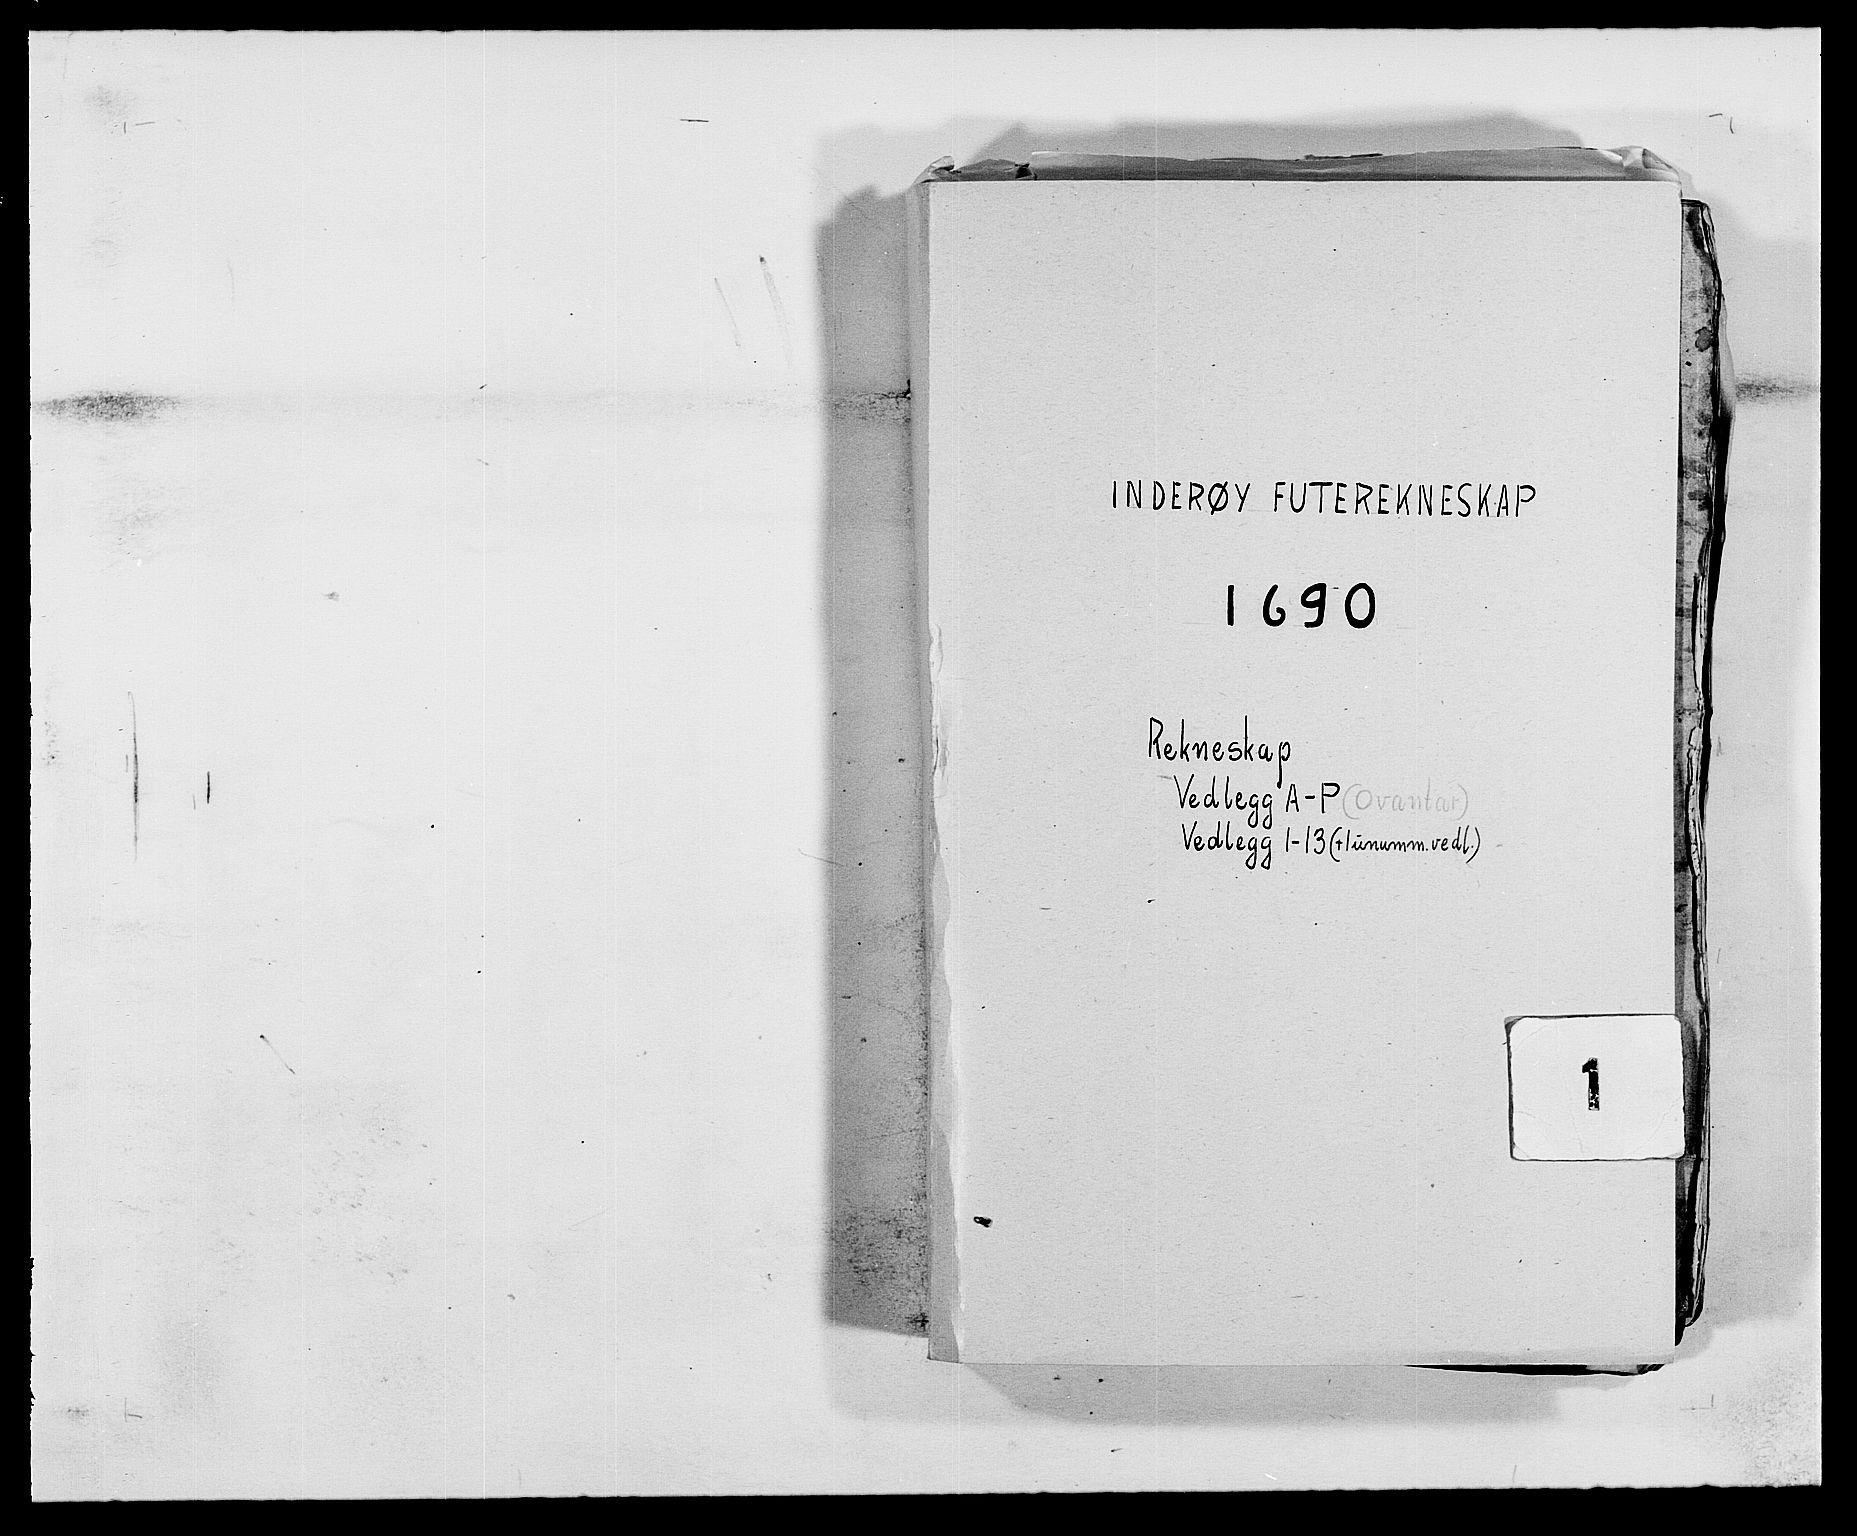 RA, Rentekammeret inntil 1814, Reviderte regnskaper, Fogderegnskap, R63/L4307: Fogderegnskap Inderøy, 1690-1691, s. 1